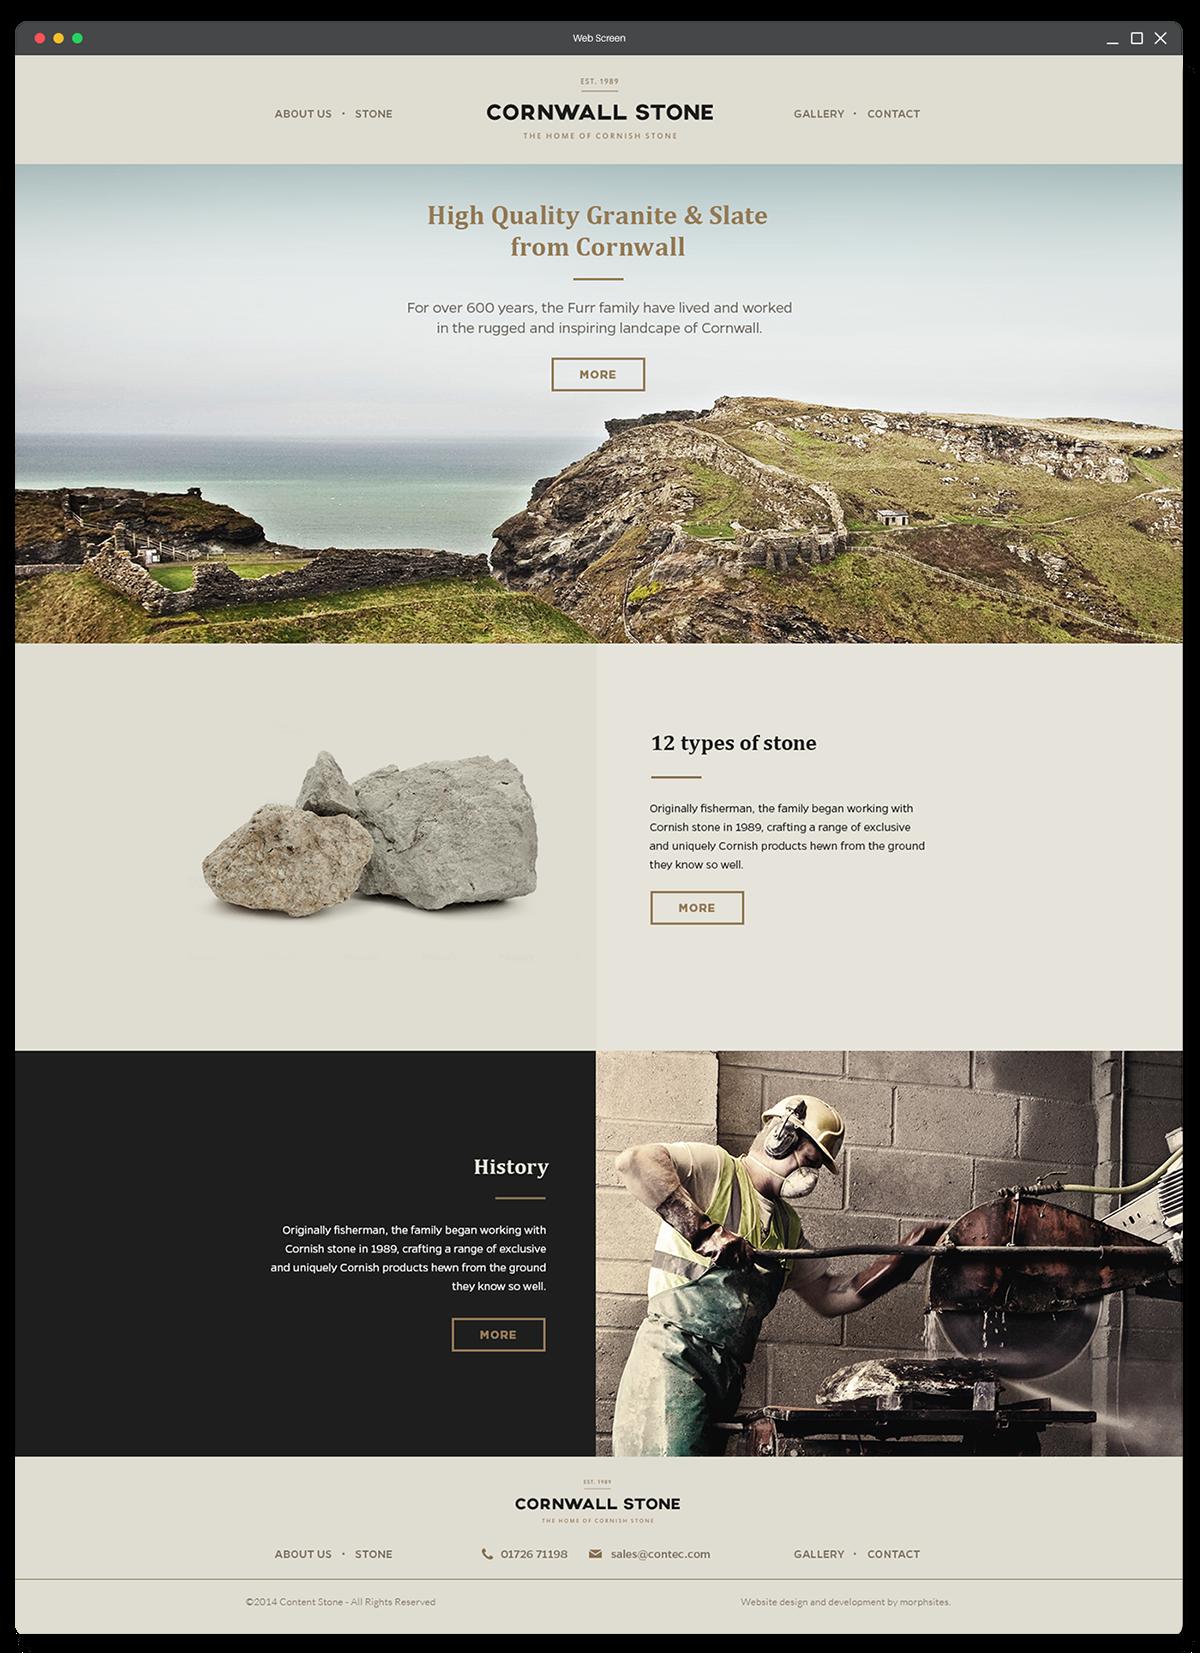 Cornwall Stone On Web Design Served Web Design Design Web App Design